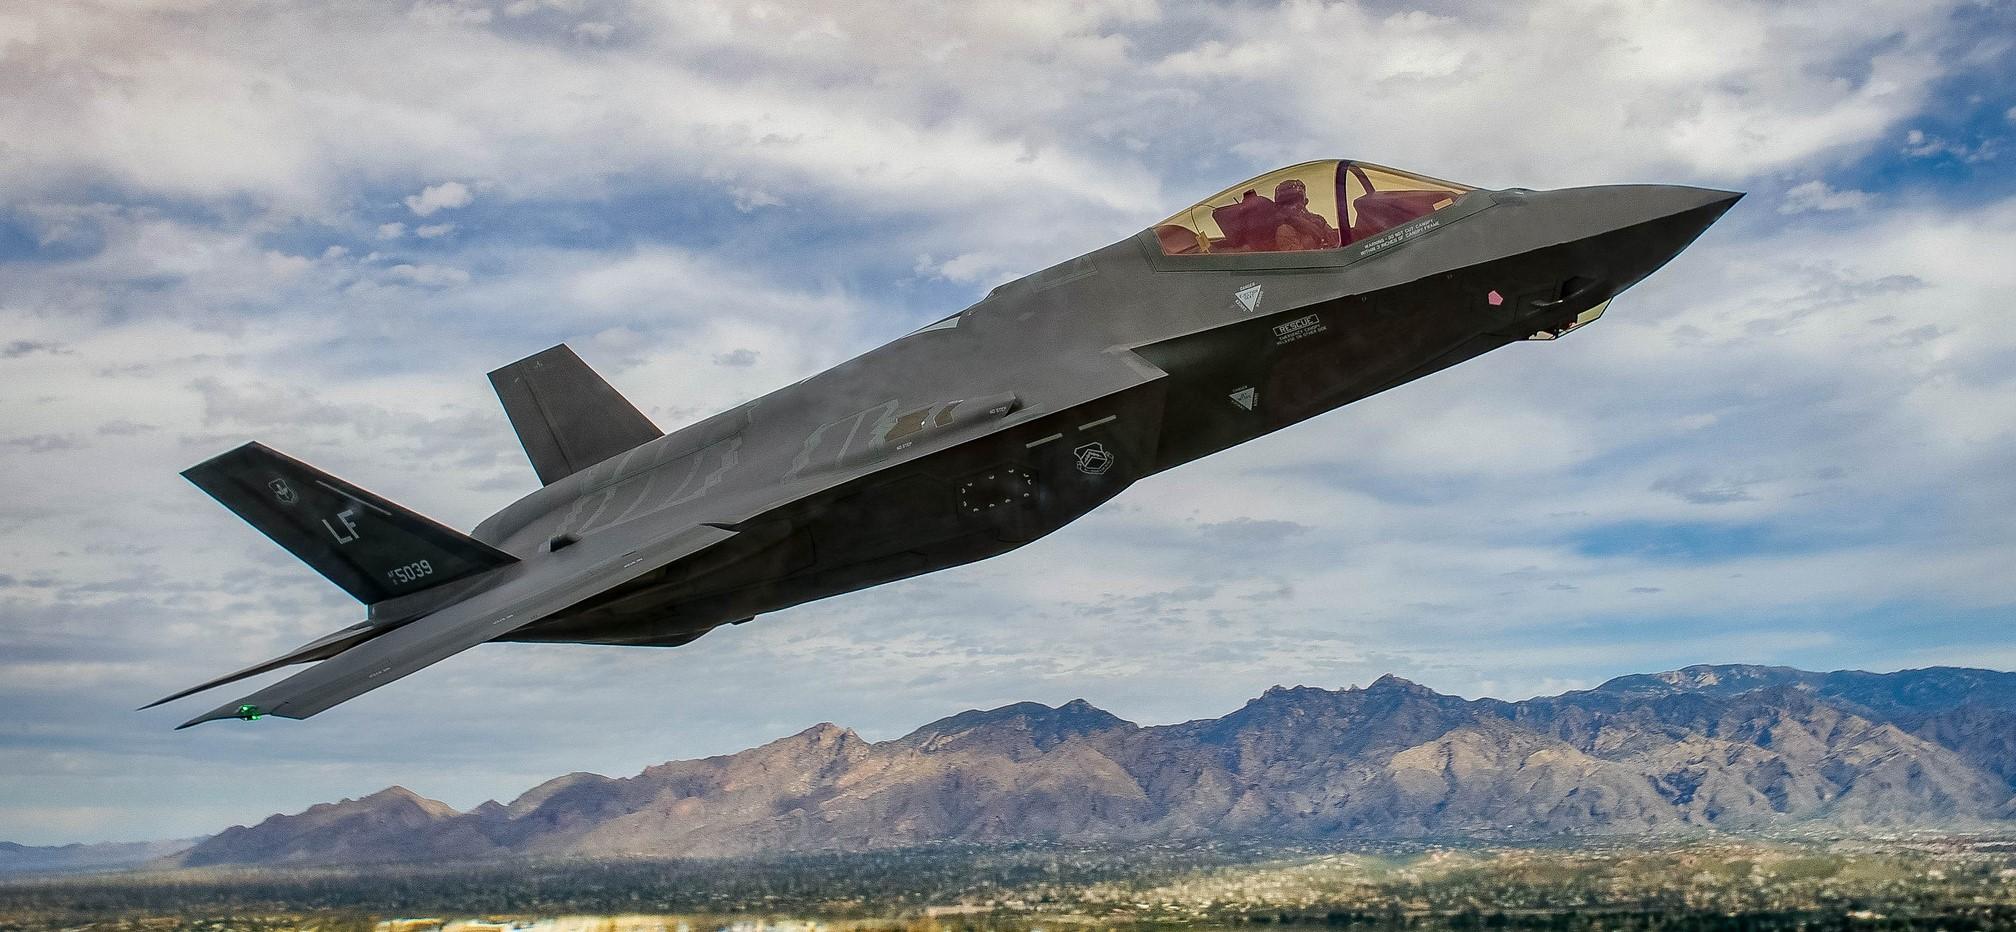 JP Aero Blog | All things Aerospace and Fasteners